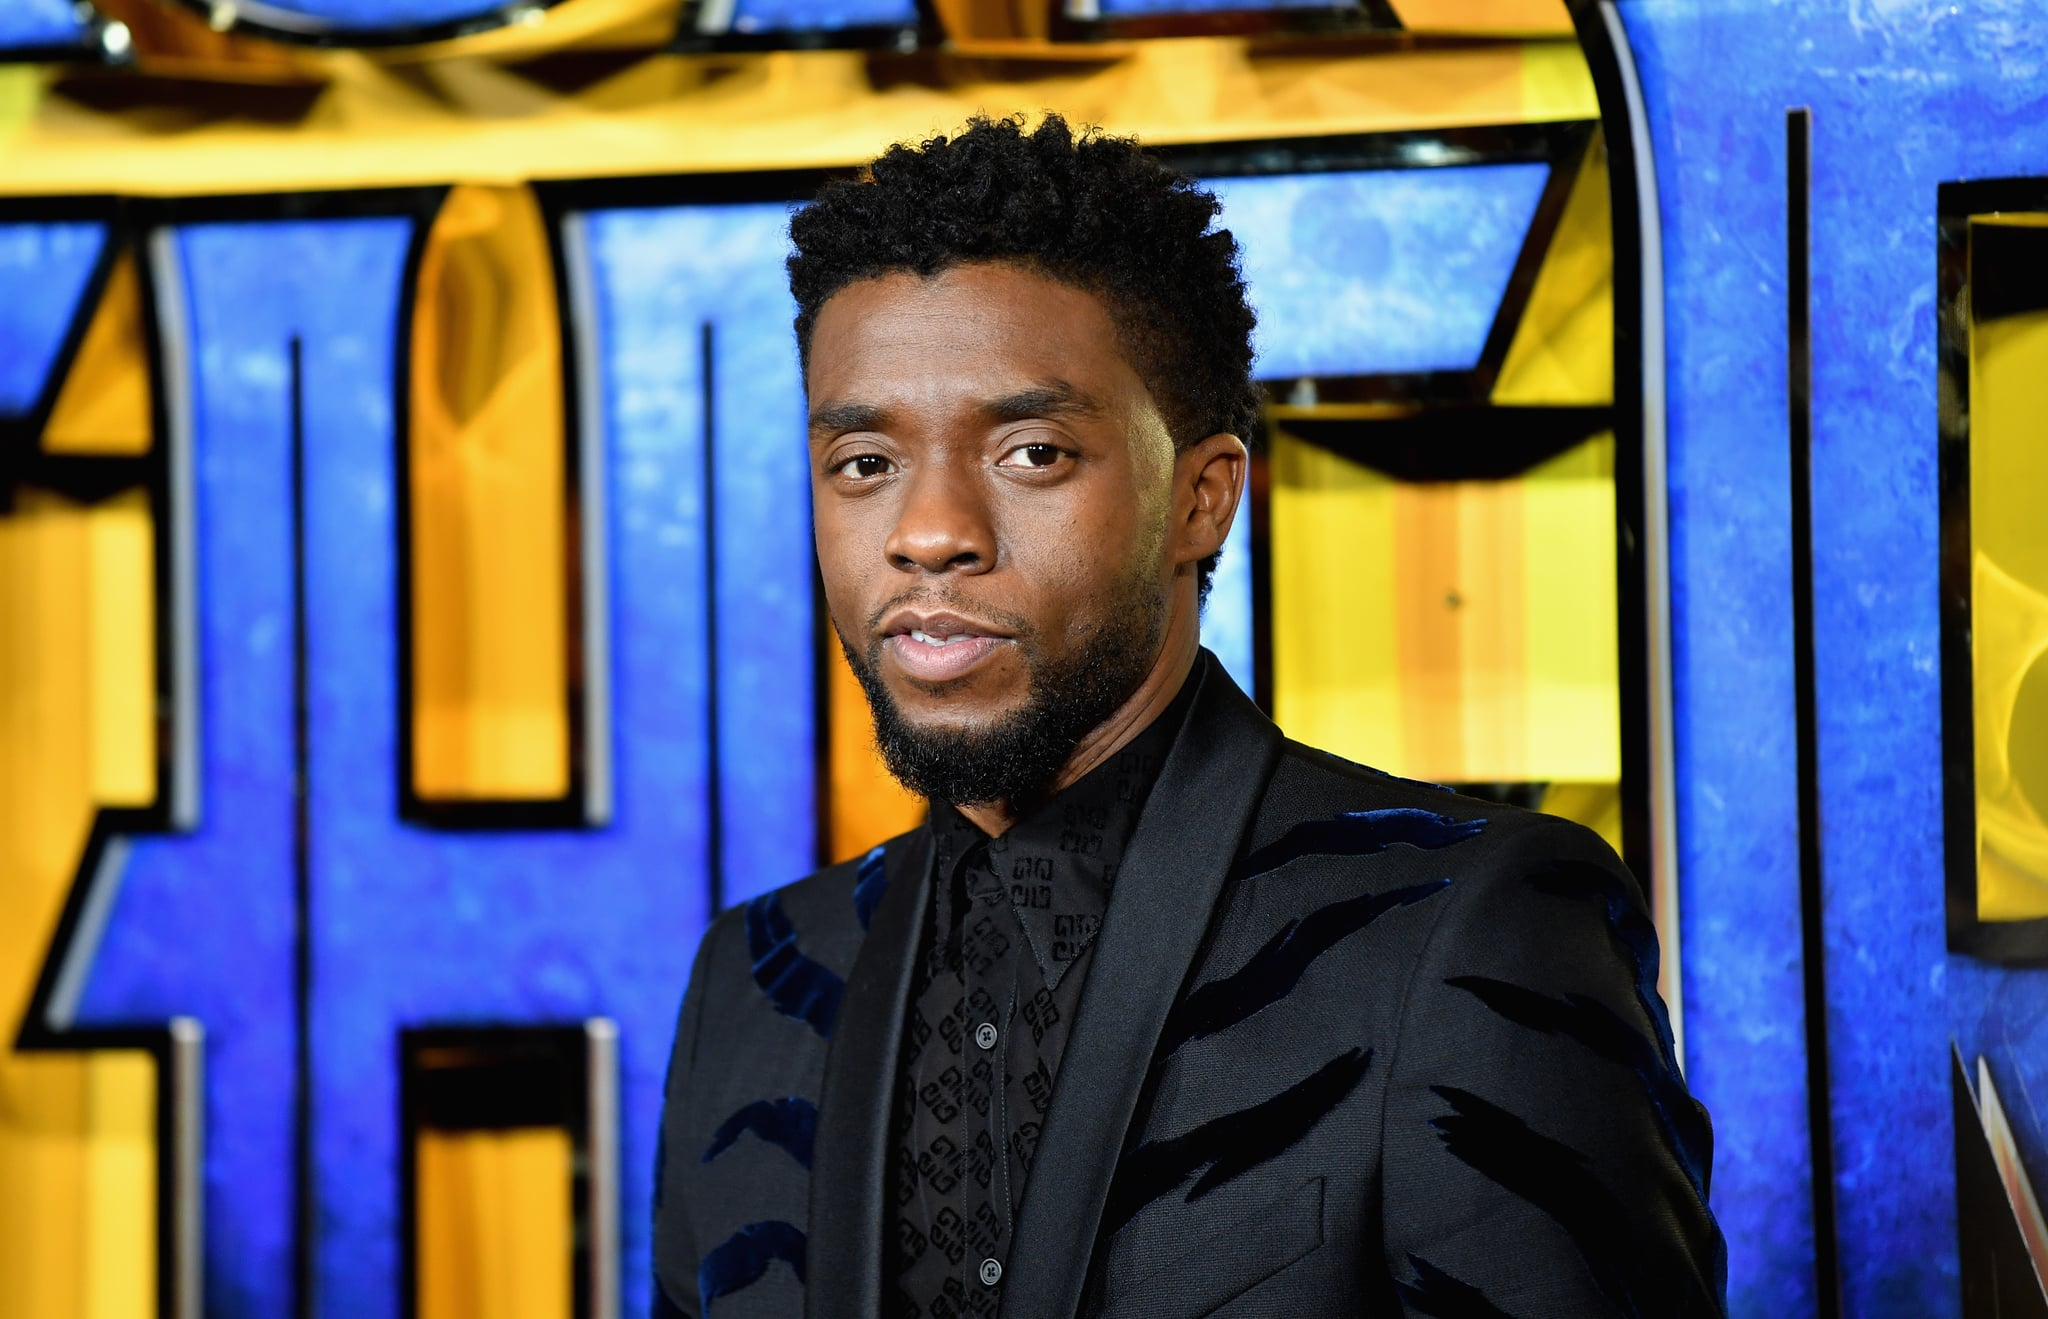 LONDON, ENGLAND - FEBRUARY 08:  Chadwick Boseman attends the European Premiere of Marvel Studios'